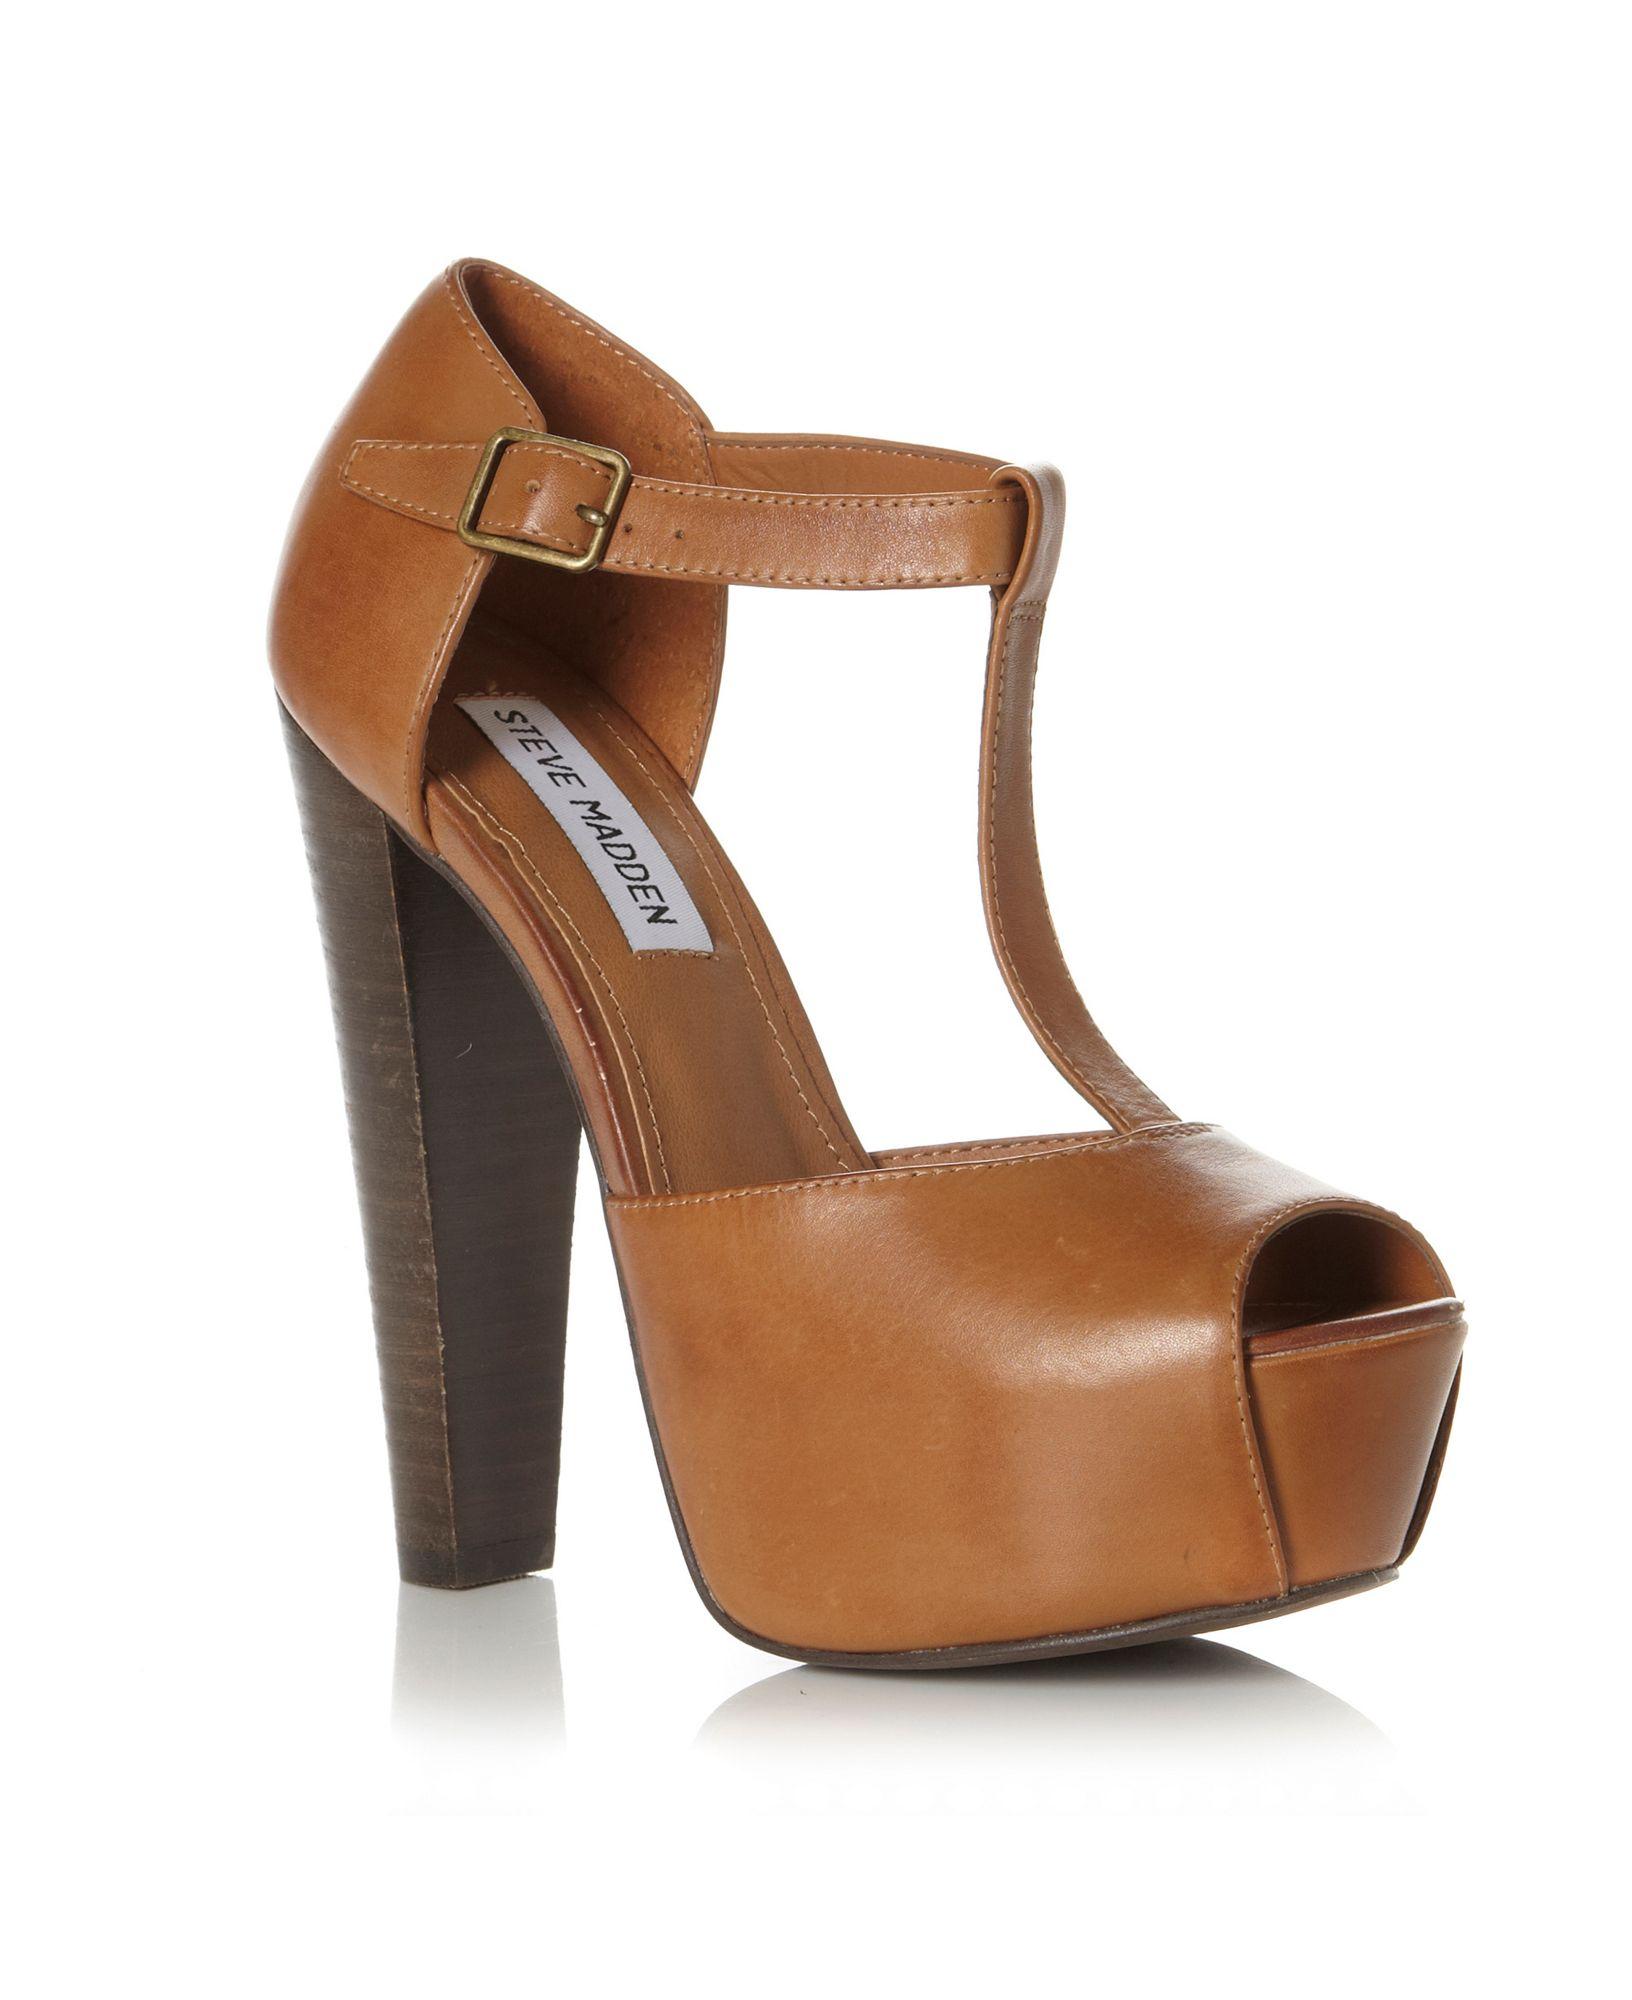 steve madden daquirri sm tbar platform sandals in brown lyst. Black Bedroom Furniture Sets. Home Design Ideas